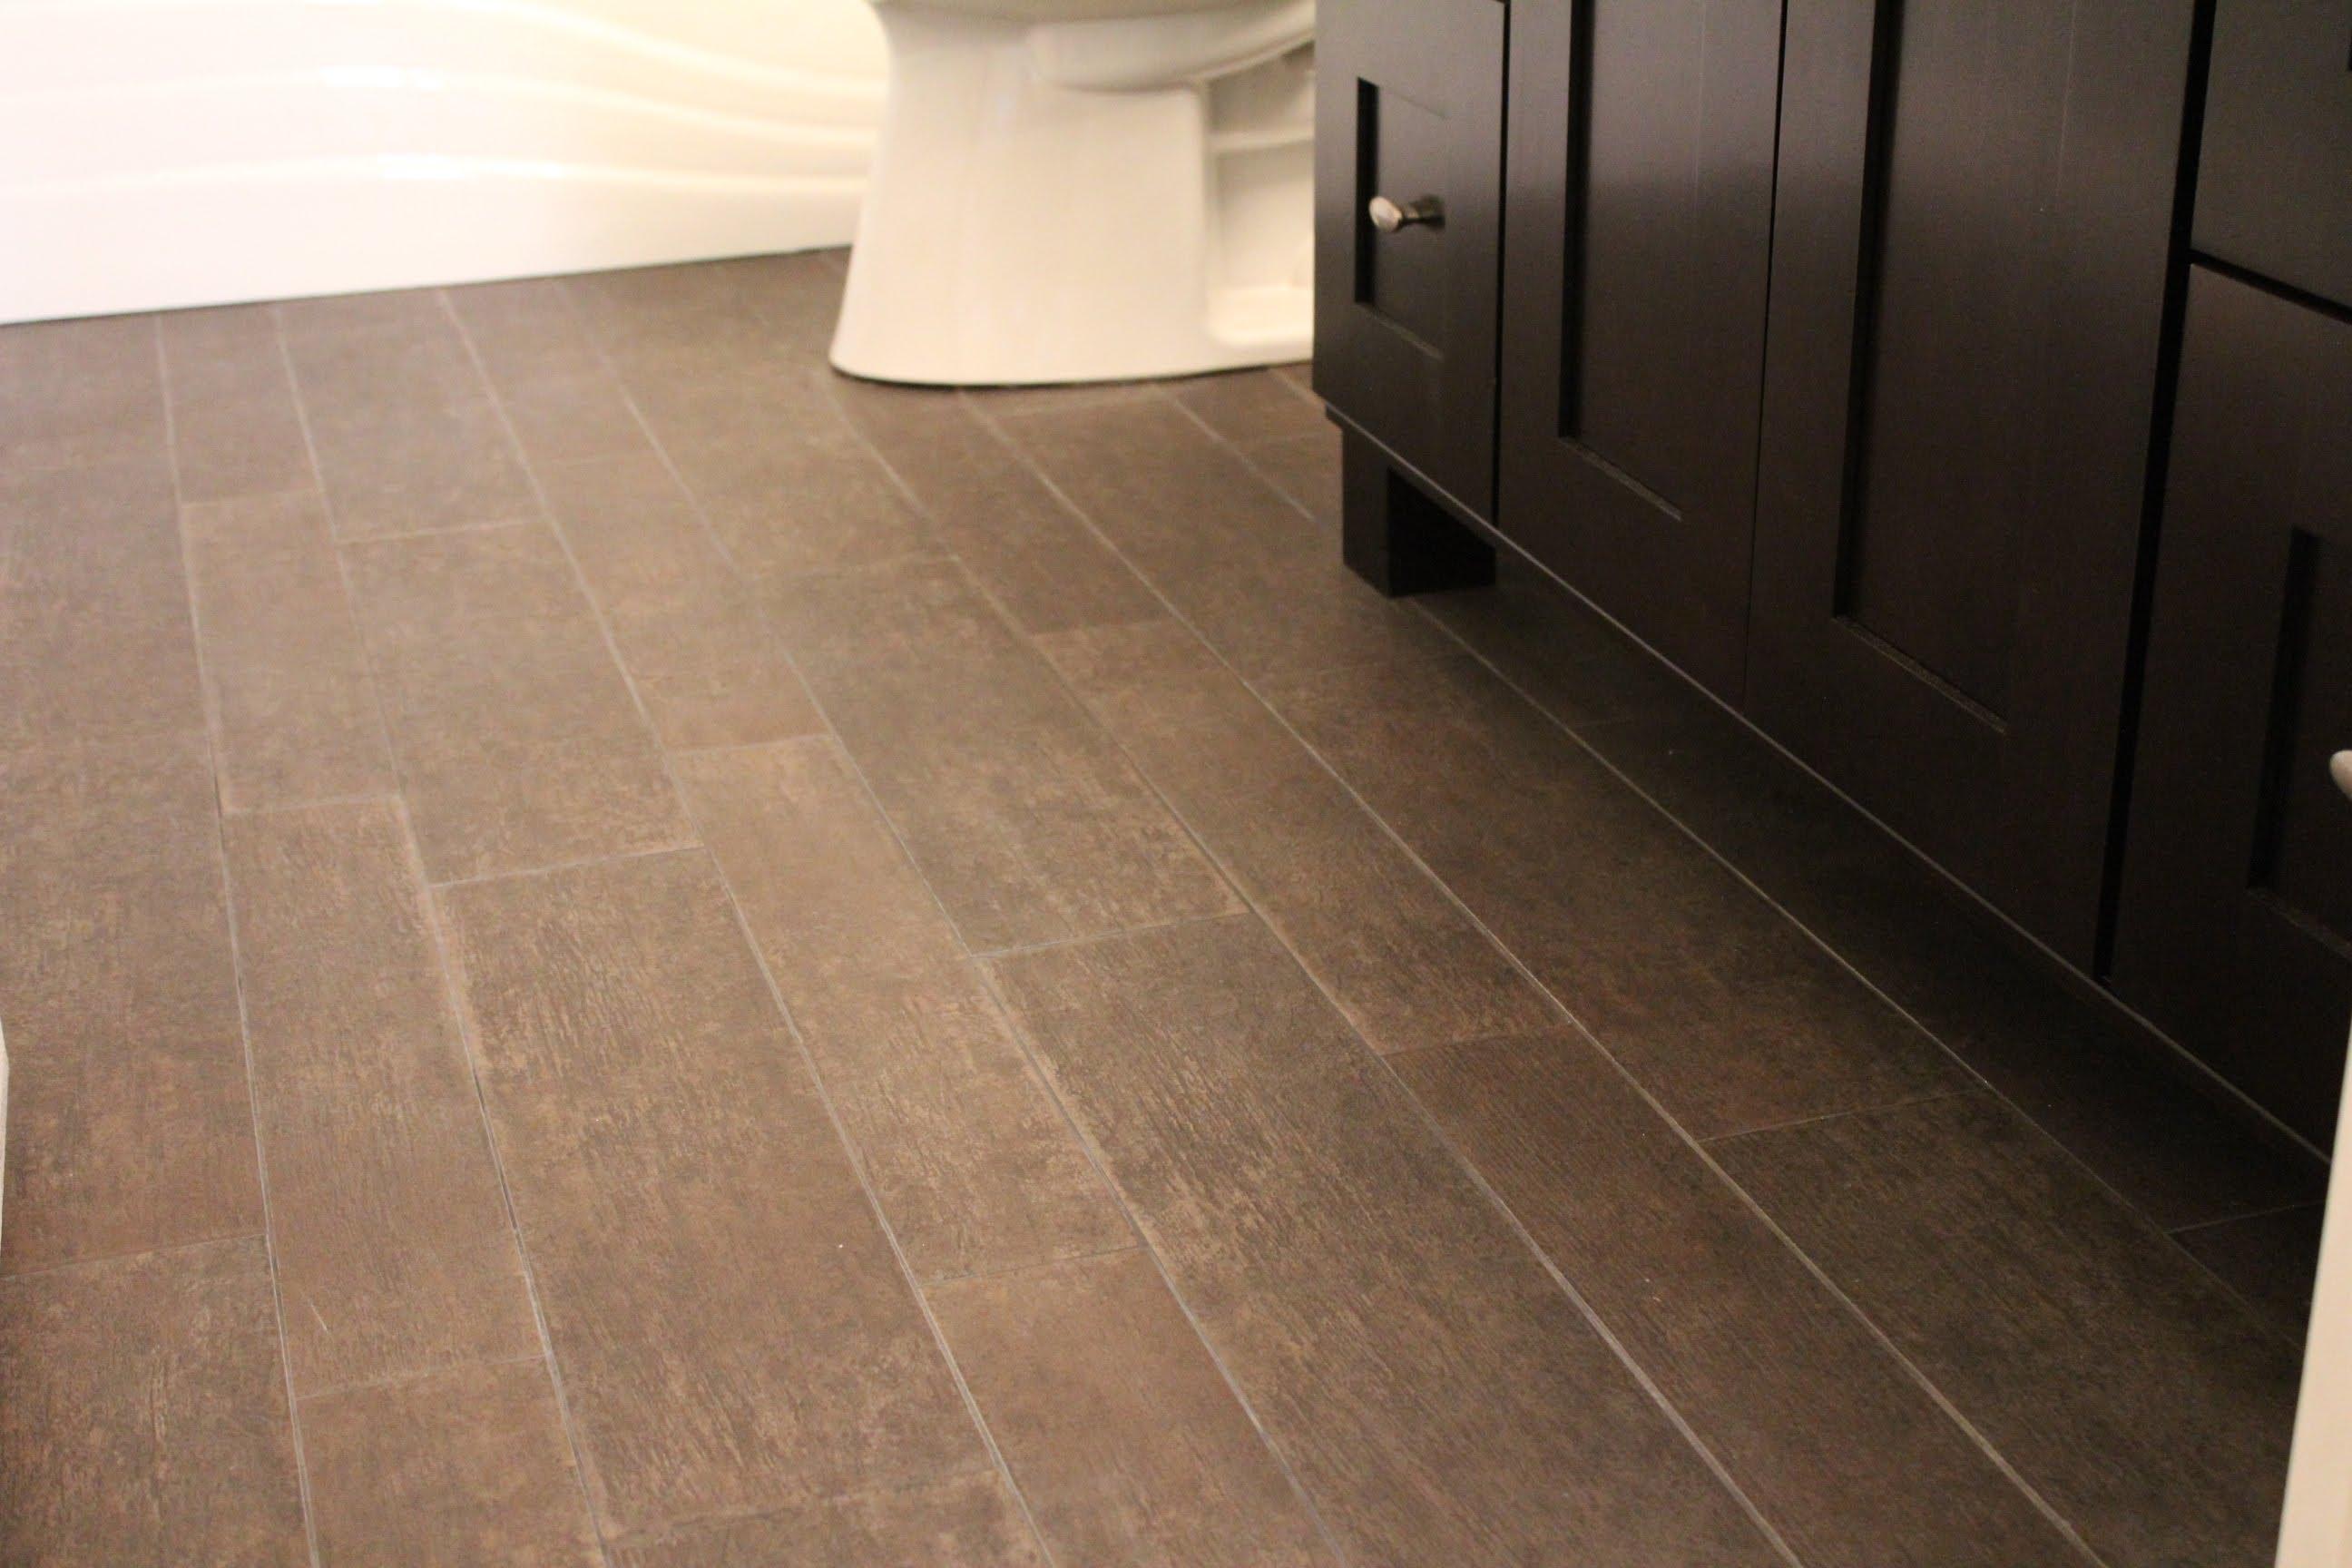 Hardwood tile flooring installing tile that looks like hardwood - youtube UPKOBWI